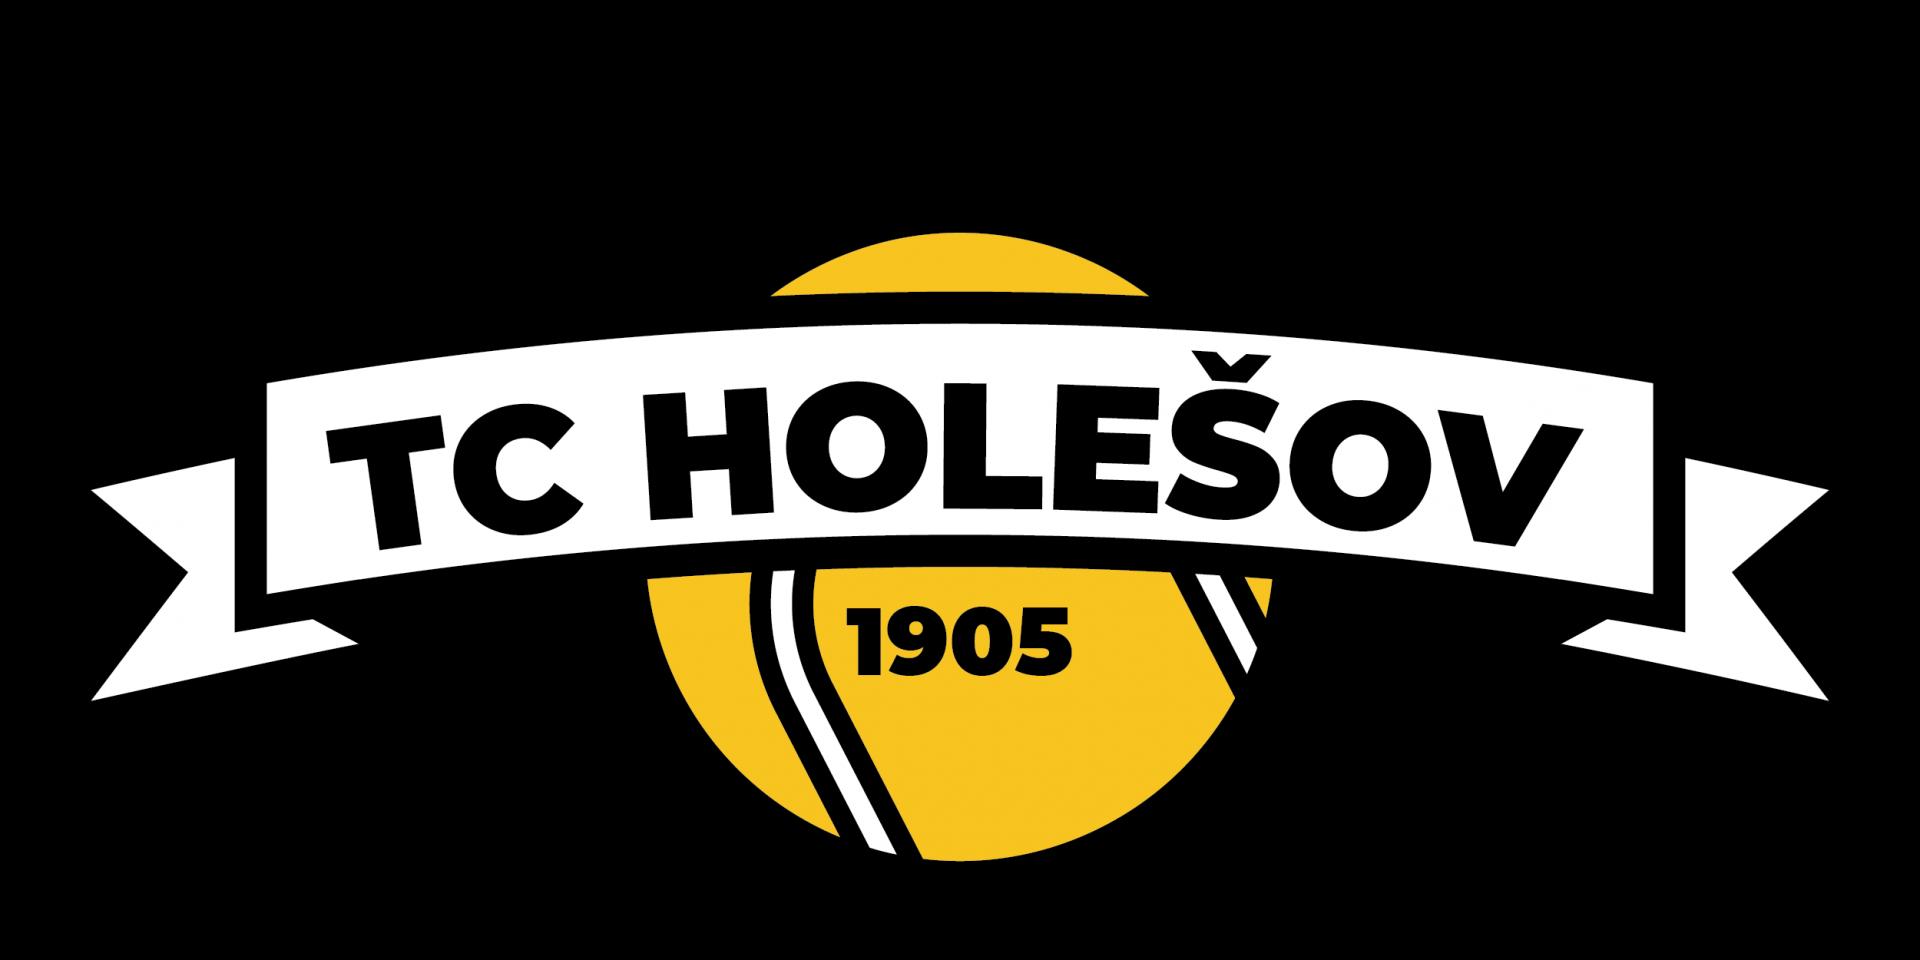 tc_holesov_logo_2020_yw.png (PNG 1920x960px )